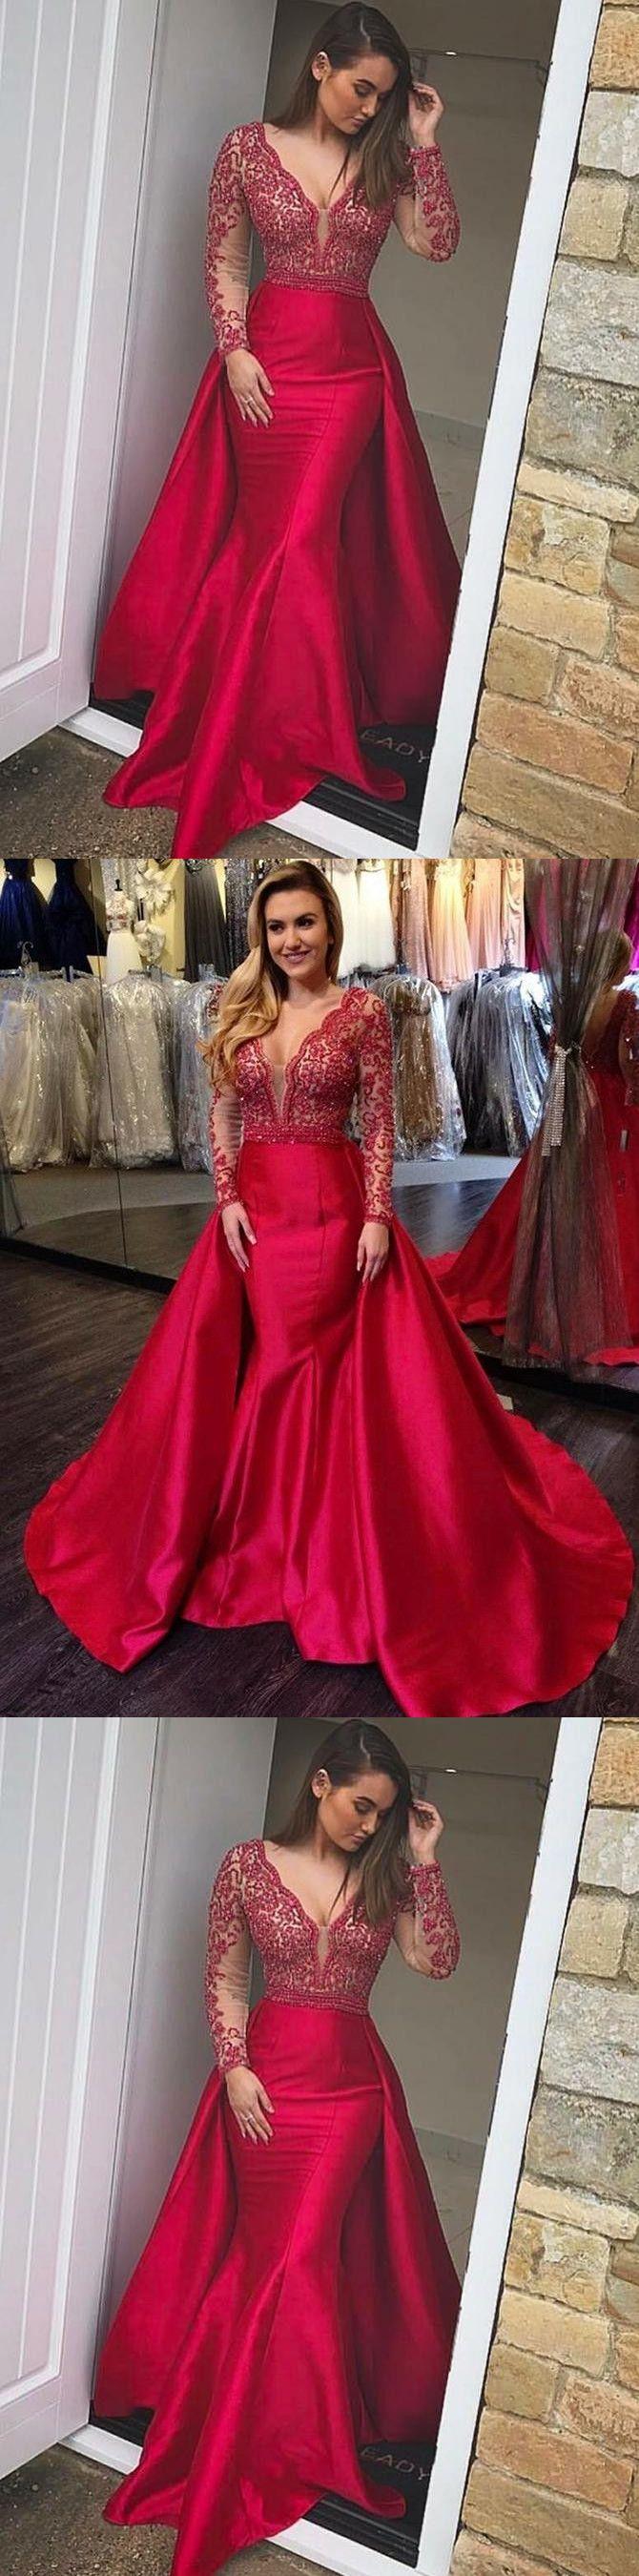 mermaid long prom dresses red long sleeve beading prom dress